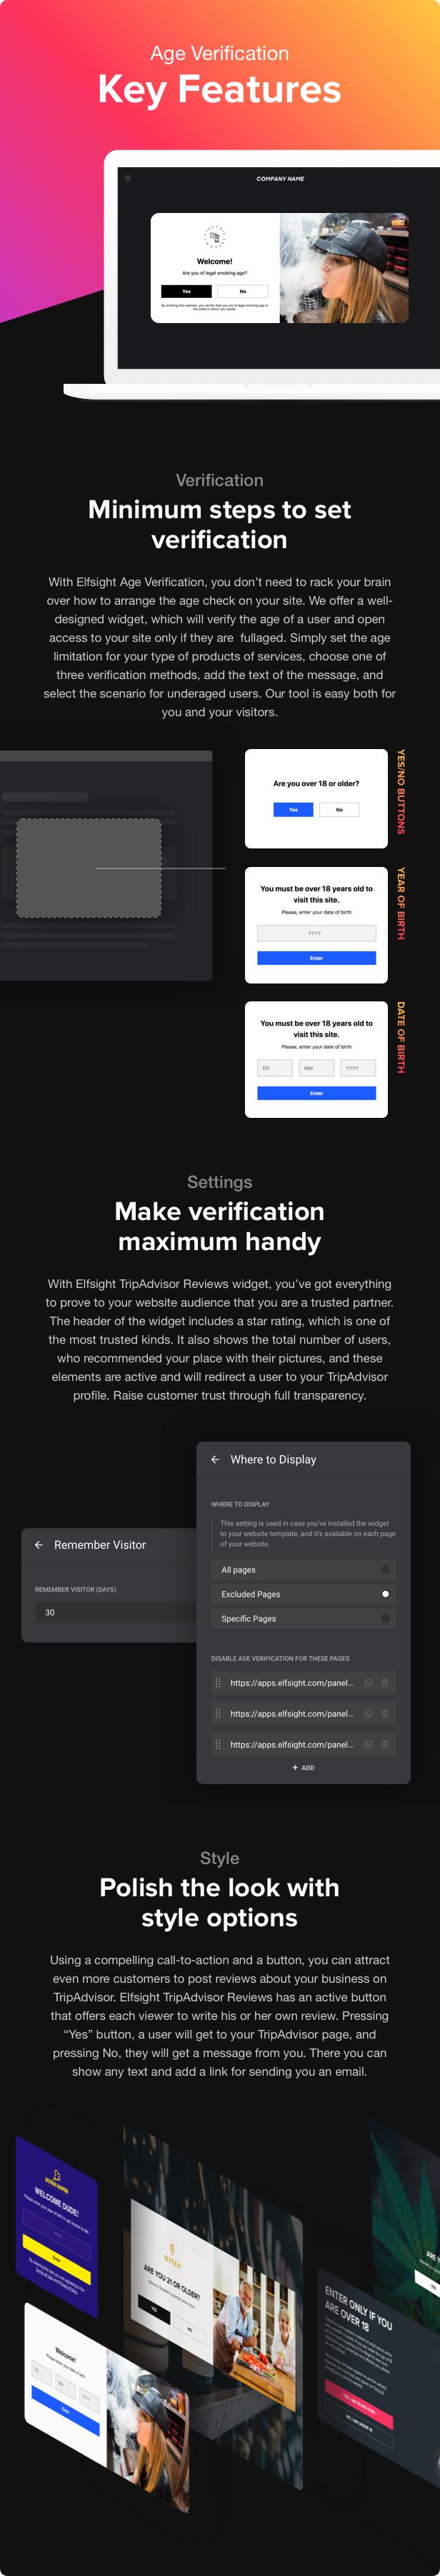 Age Verification for WordPress - 1